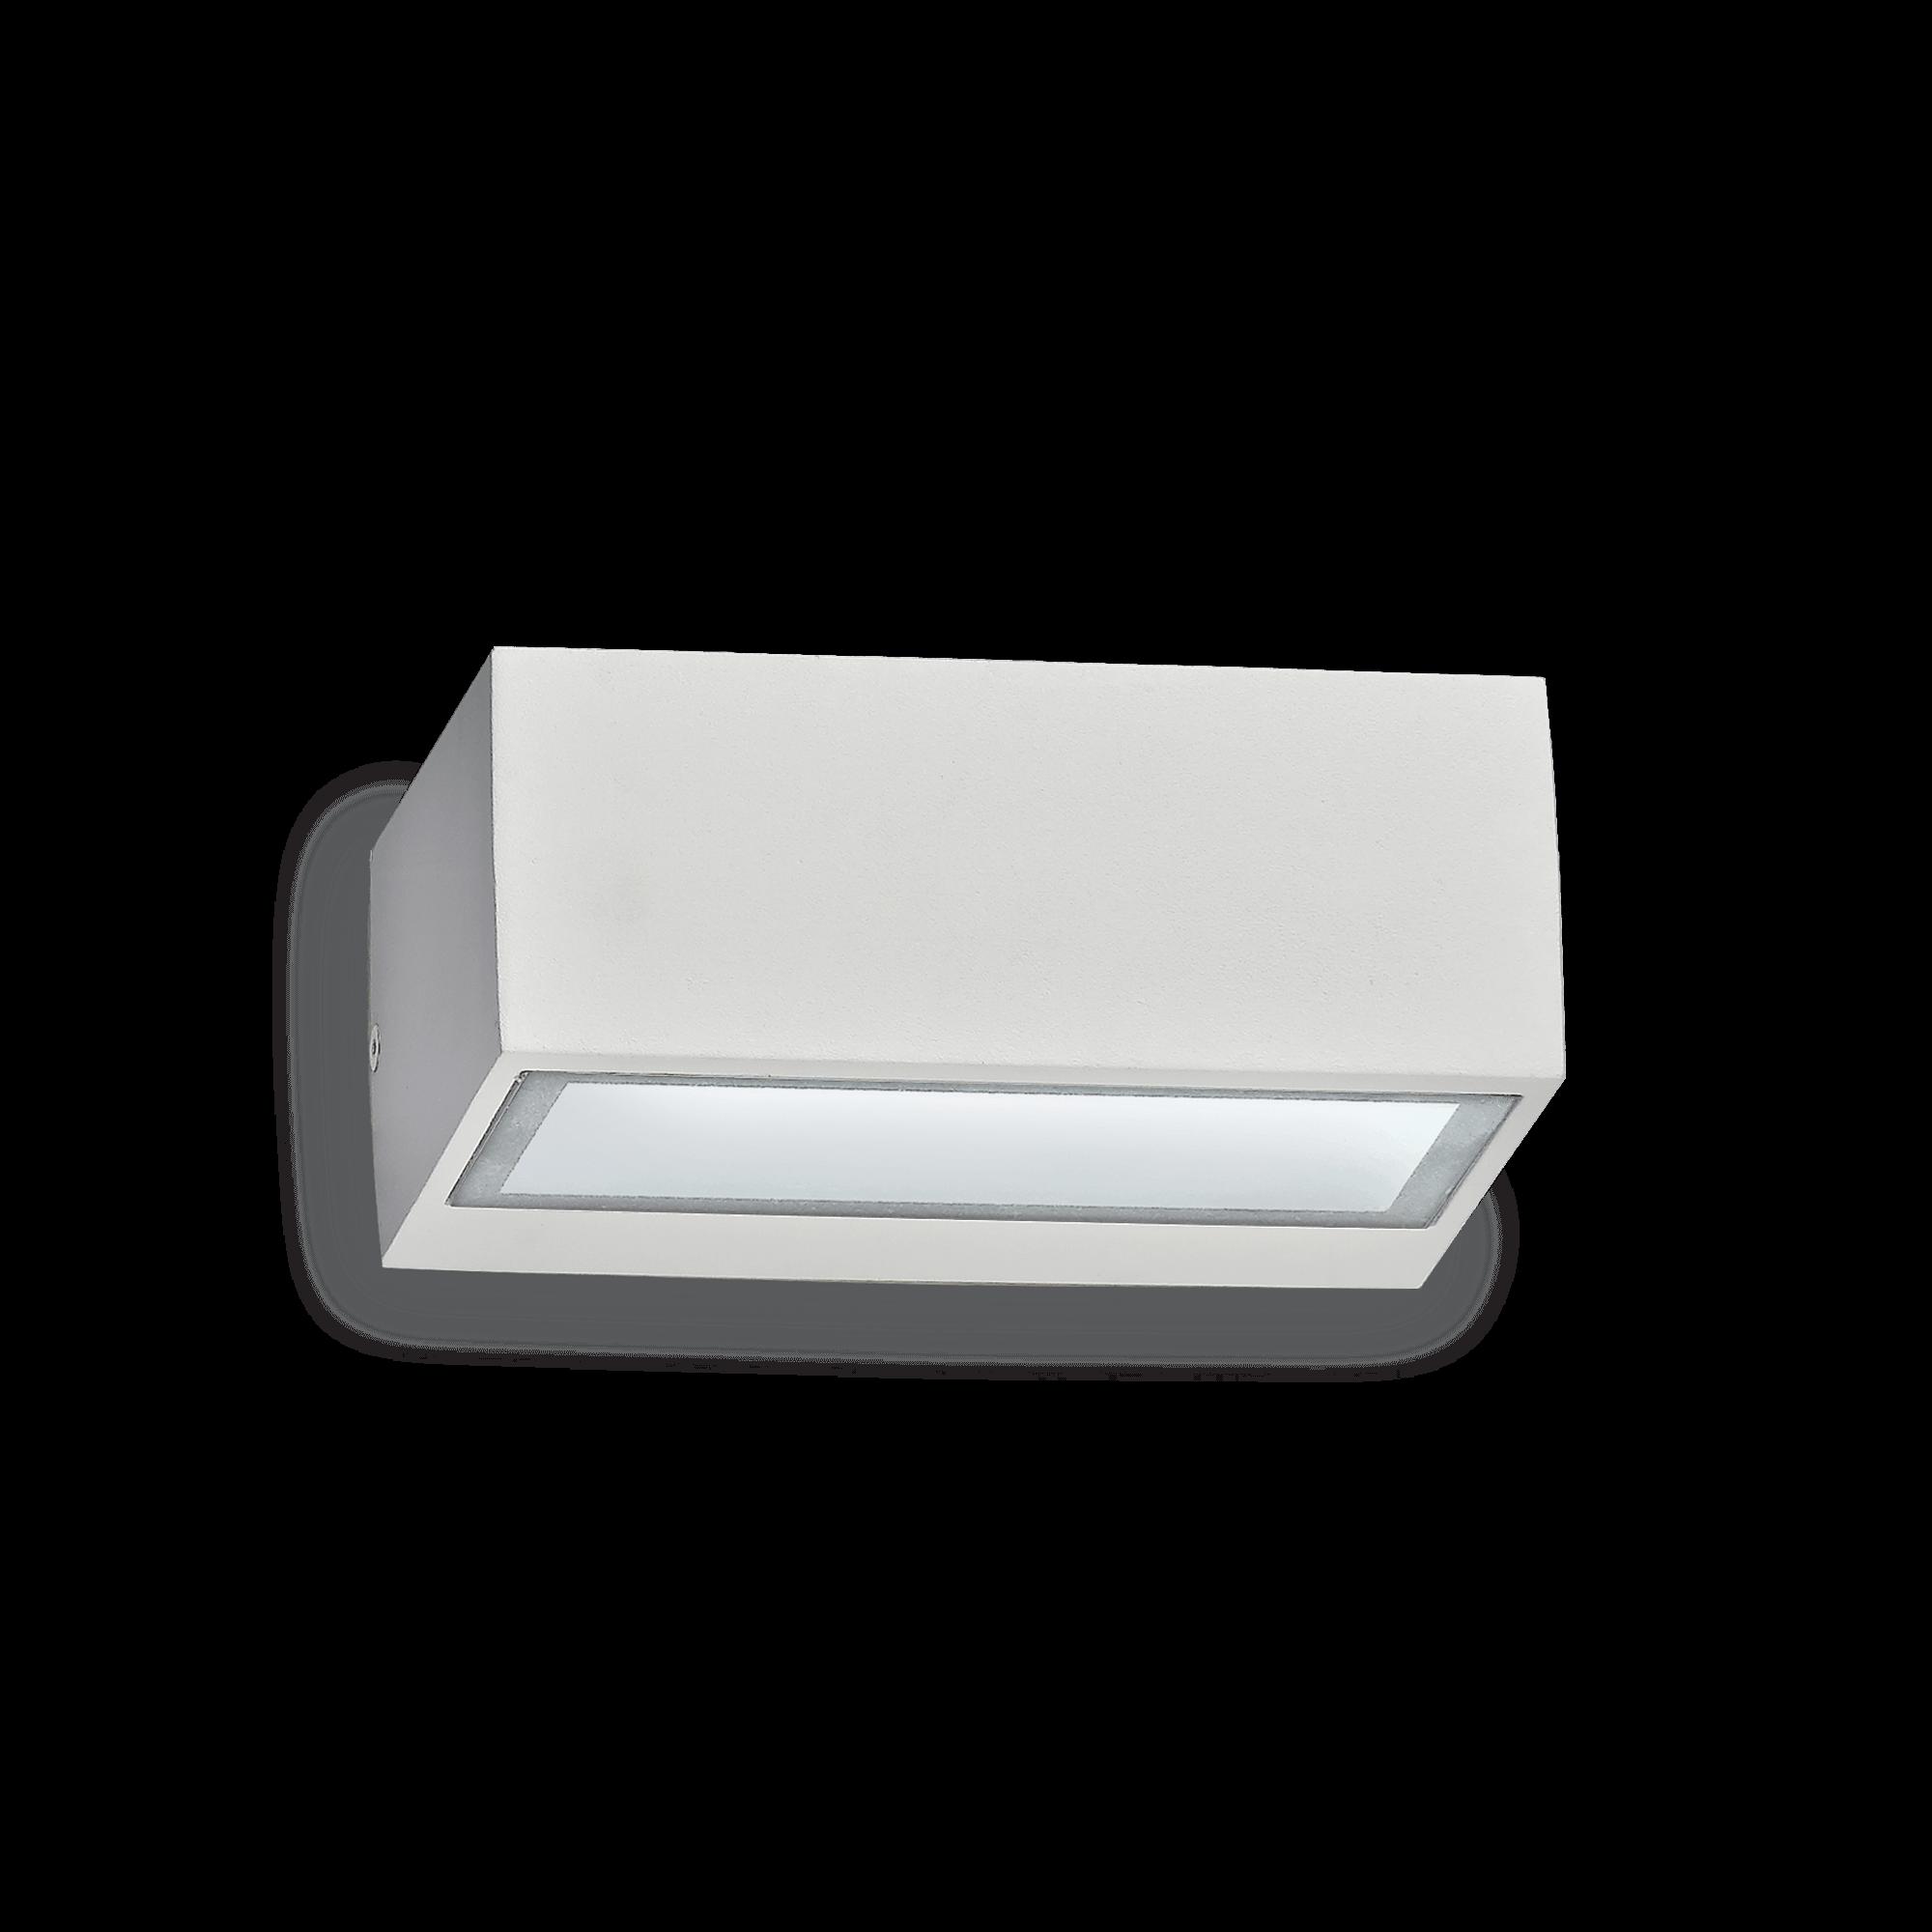 Idea Lux 115351 Twin AP1 Bianco kültéri fali lámpa